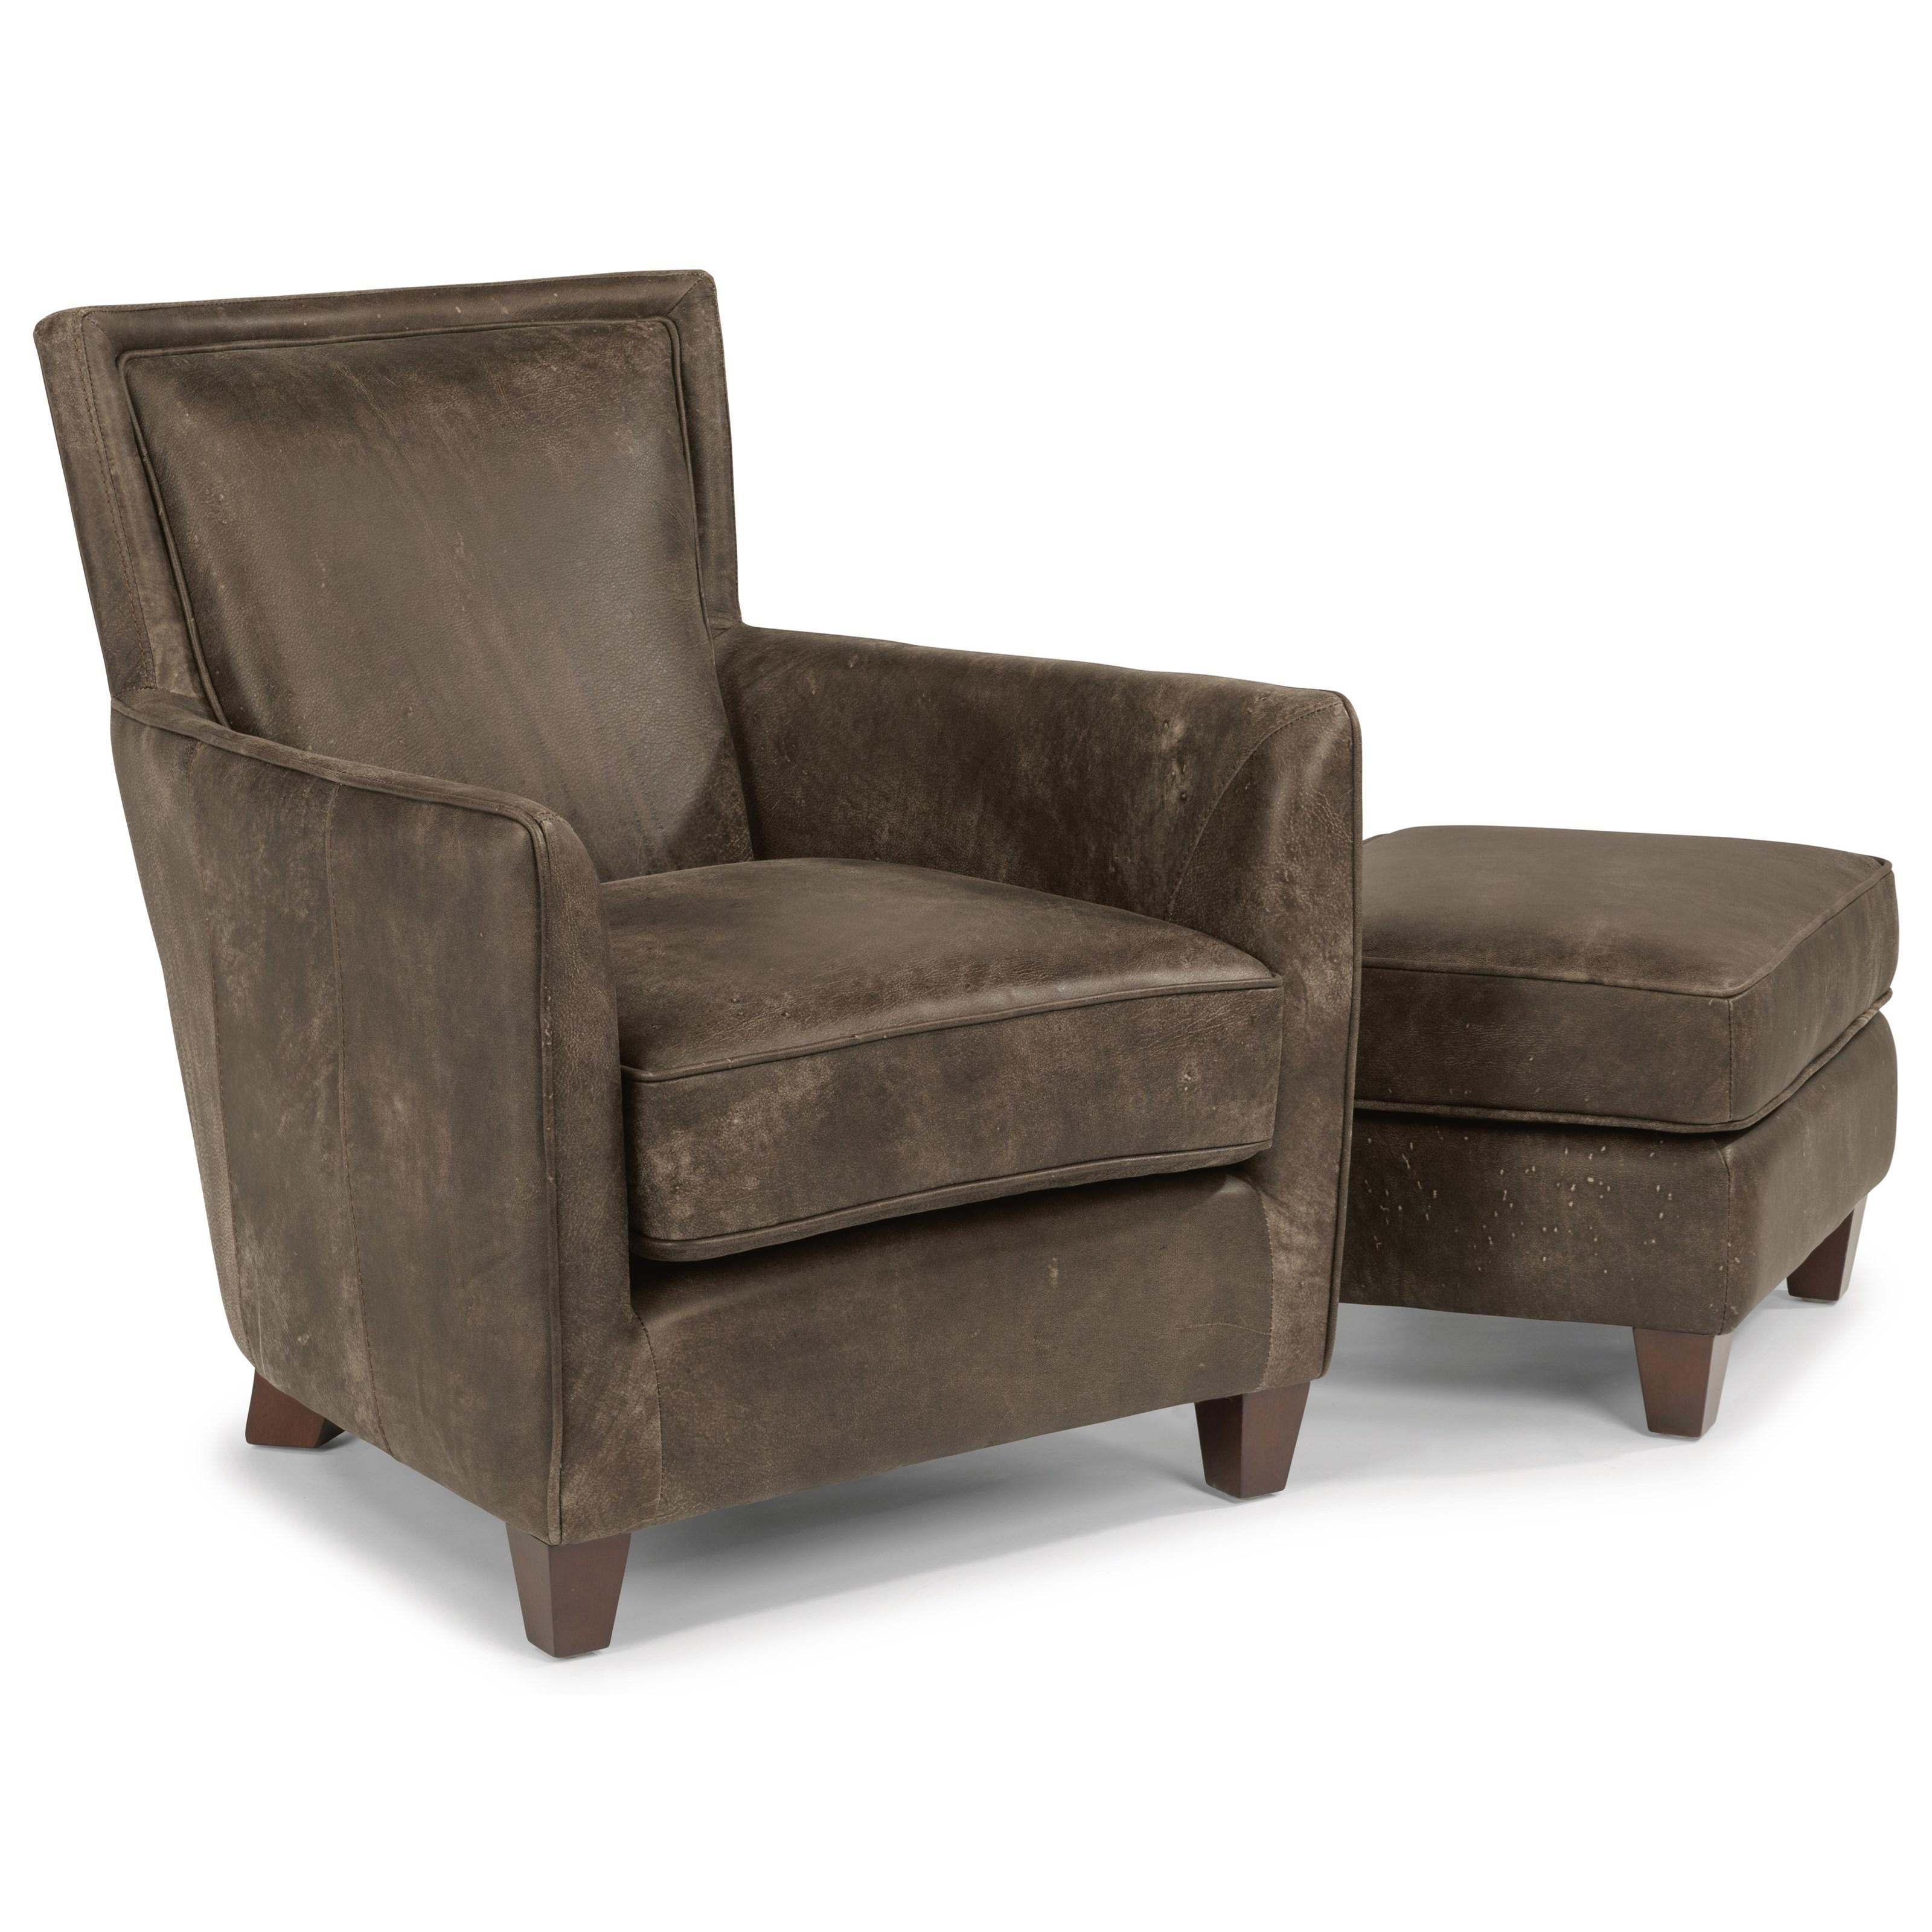 flexsteel sofa sets living room decorating ideas burgundy latitudes kingston contemporary leather chair